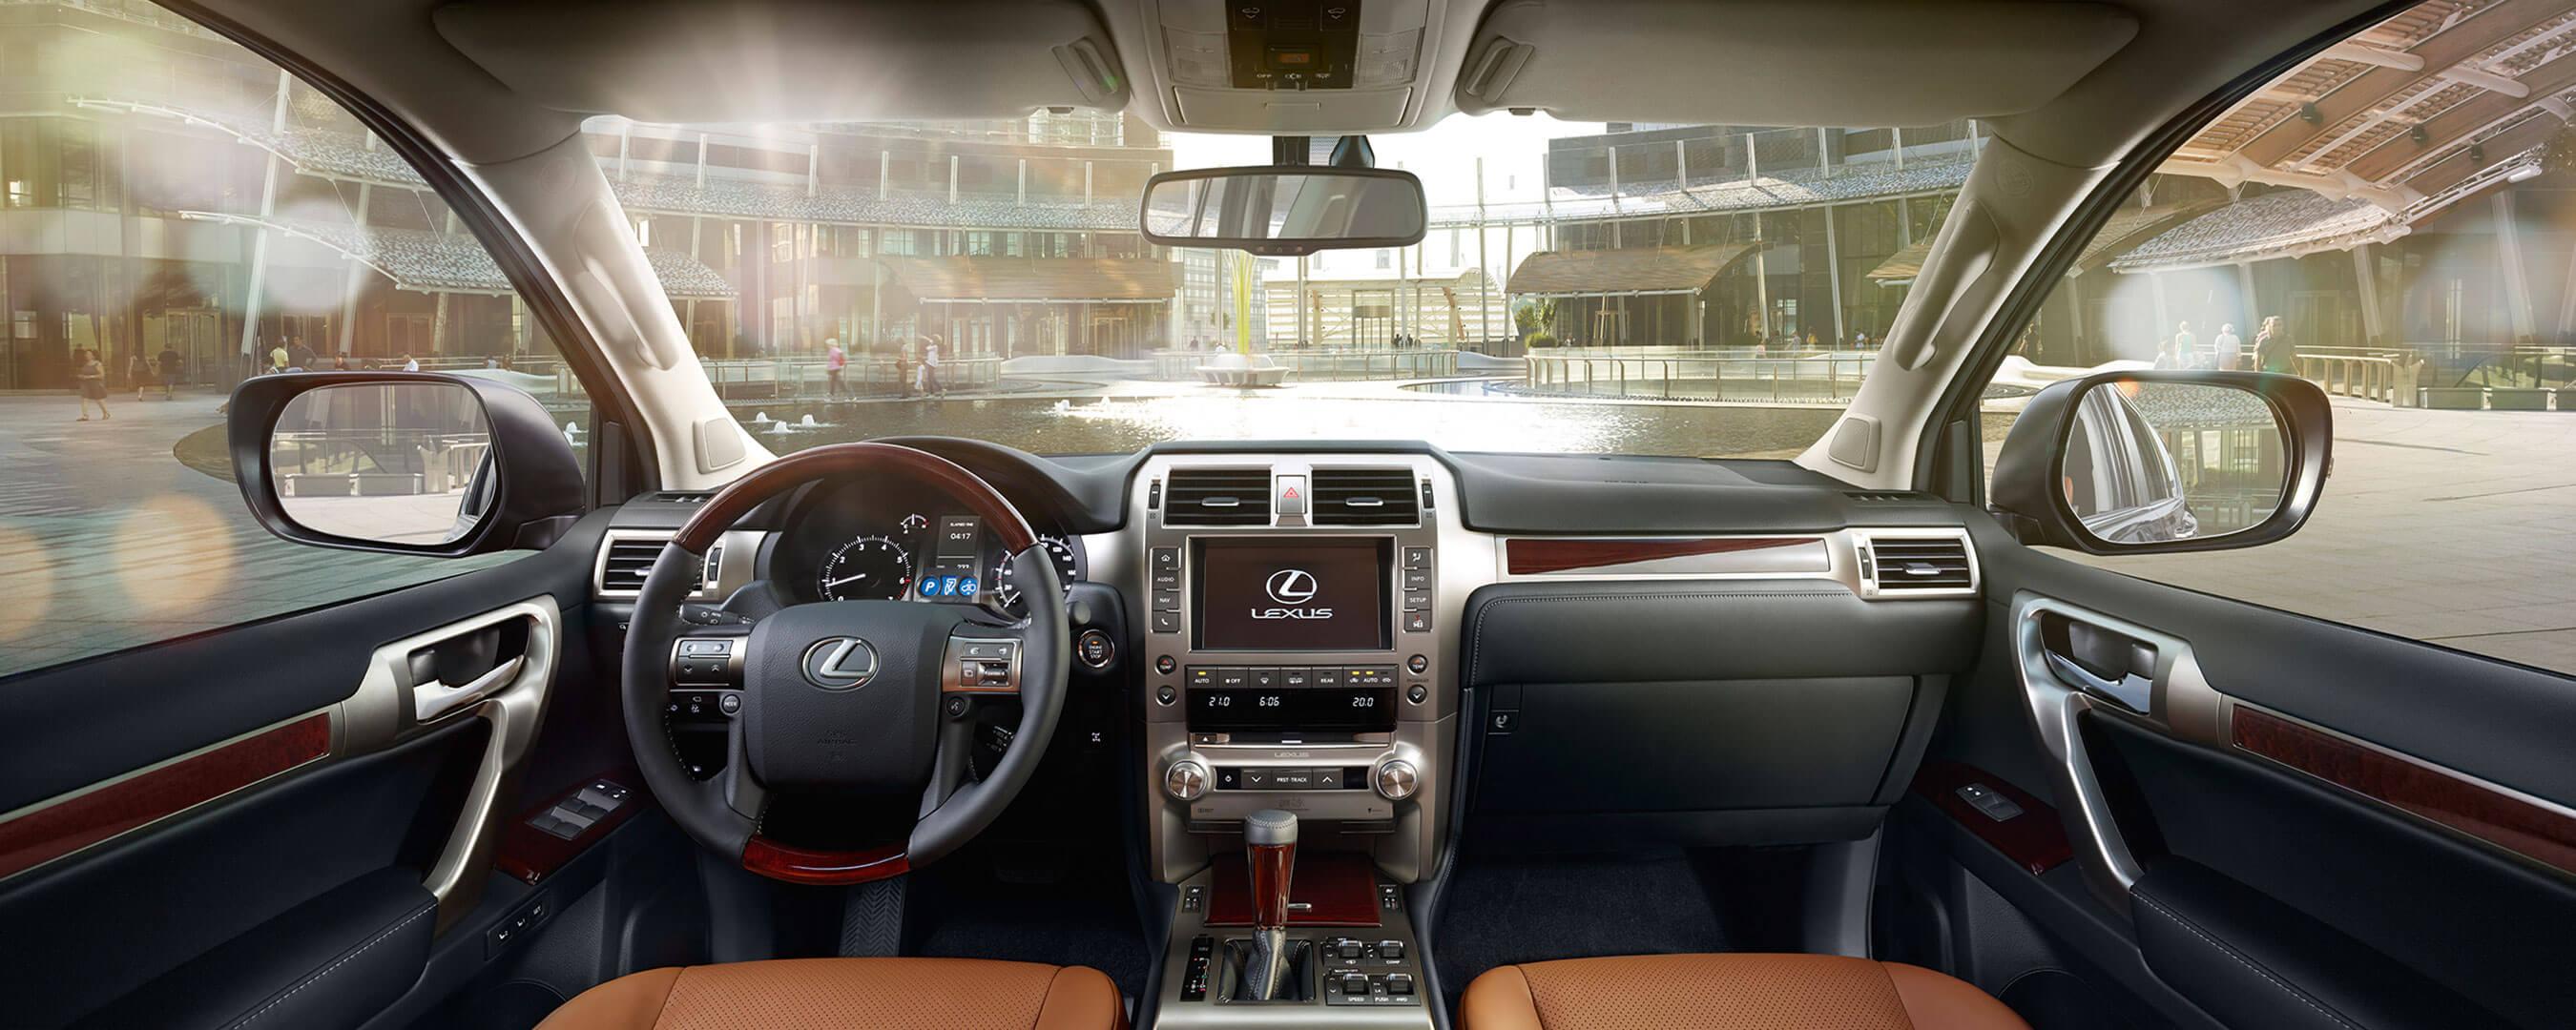 2017 lexus gx 460 experience hero interior front